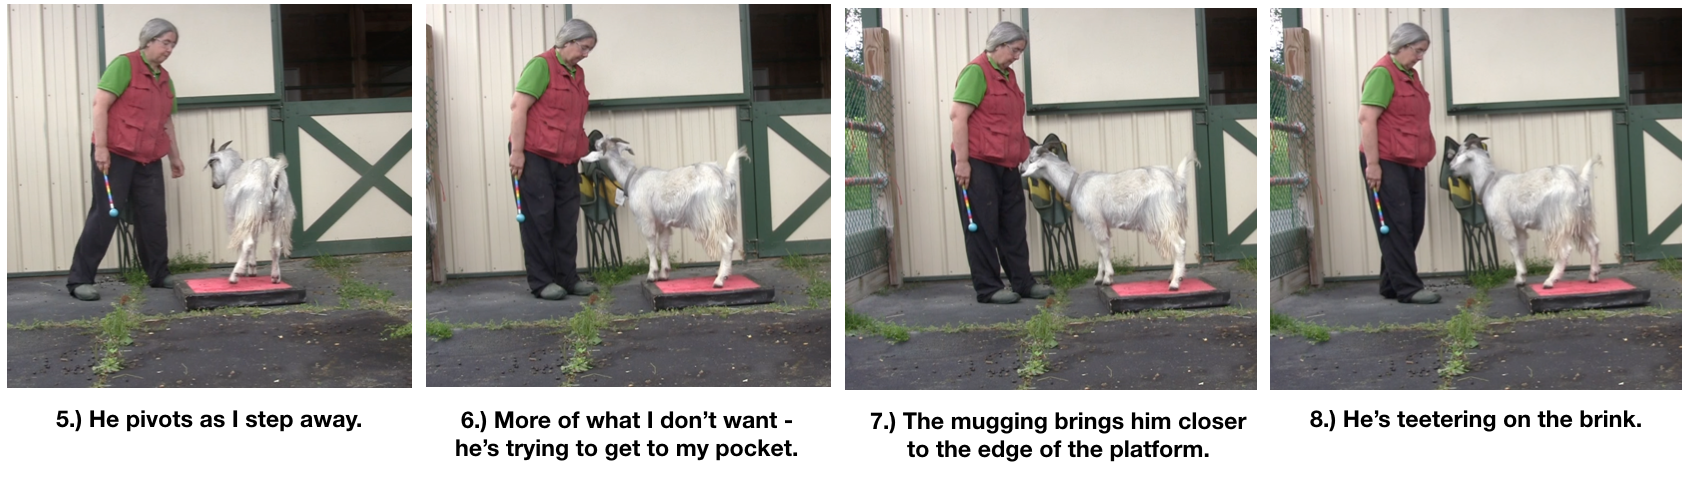 Goat Diaries Day 4 - P - Platforms Pt 1 - panels 5-8.png